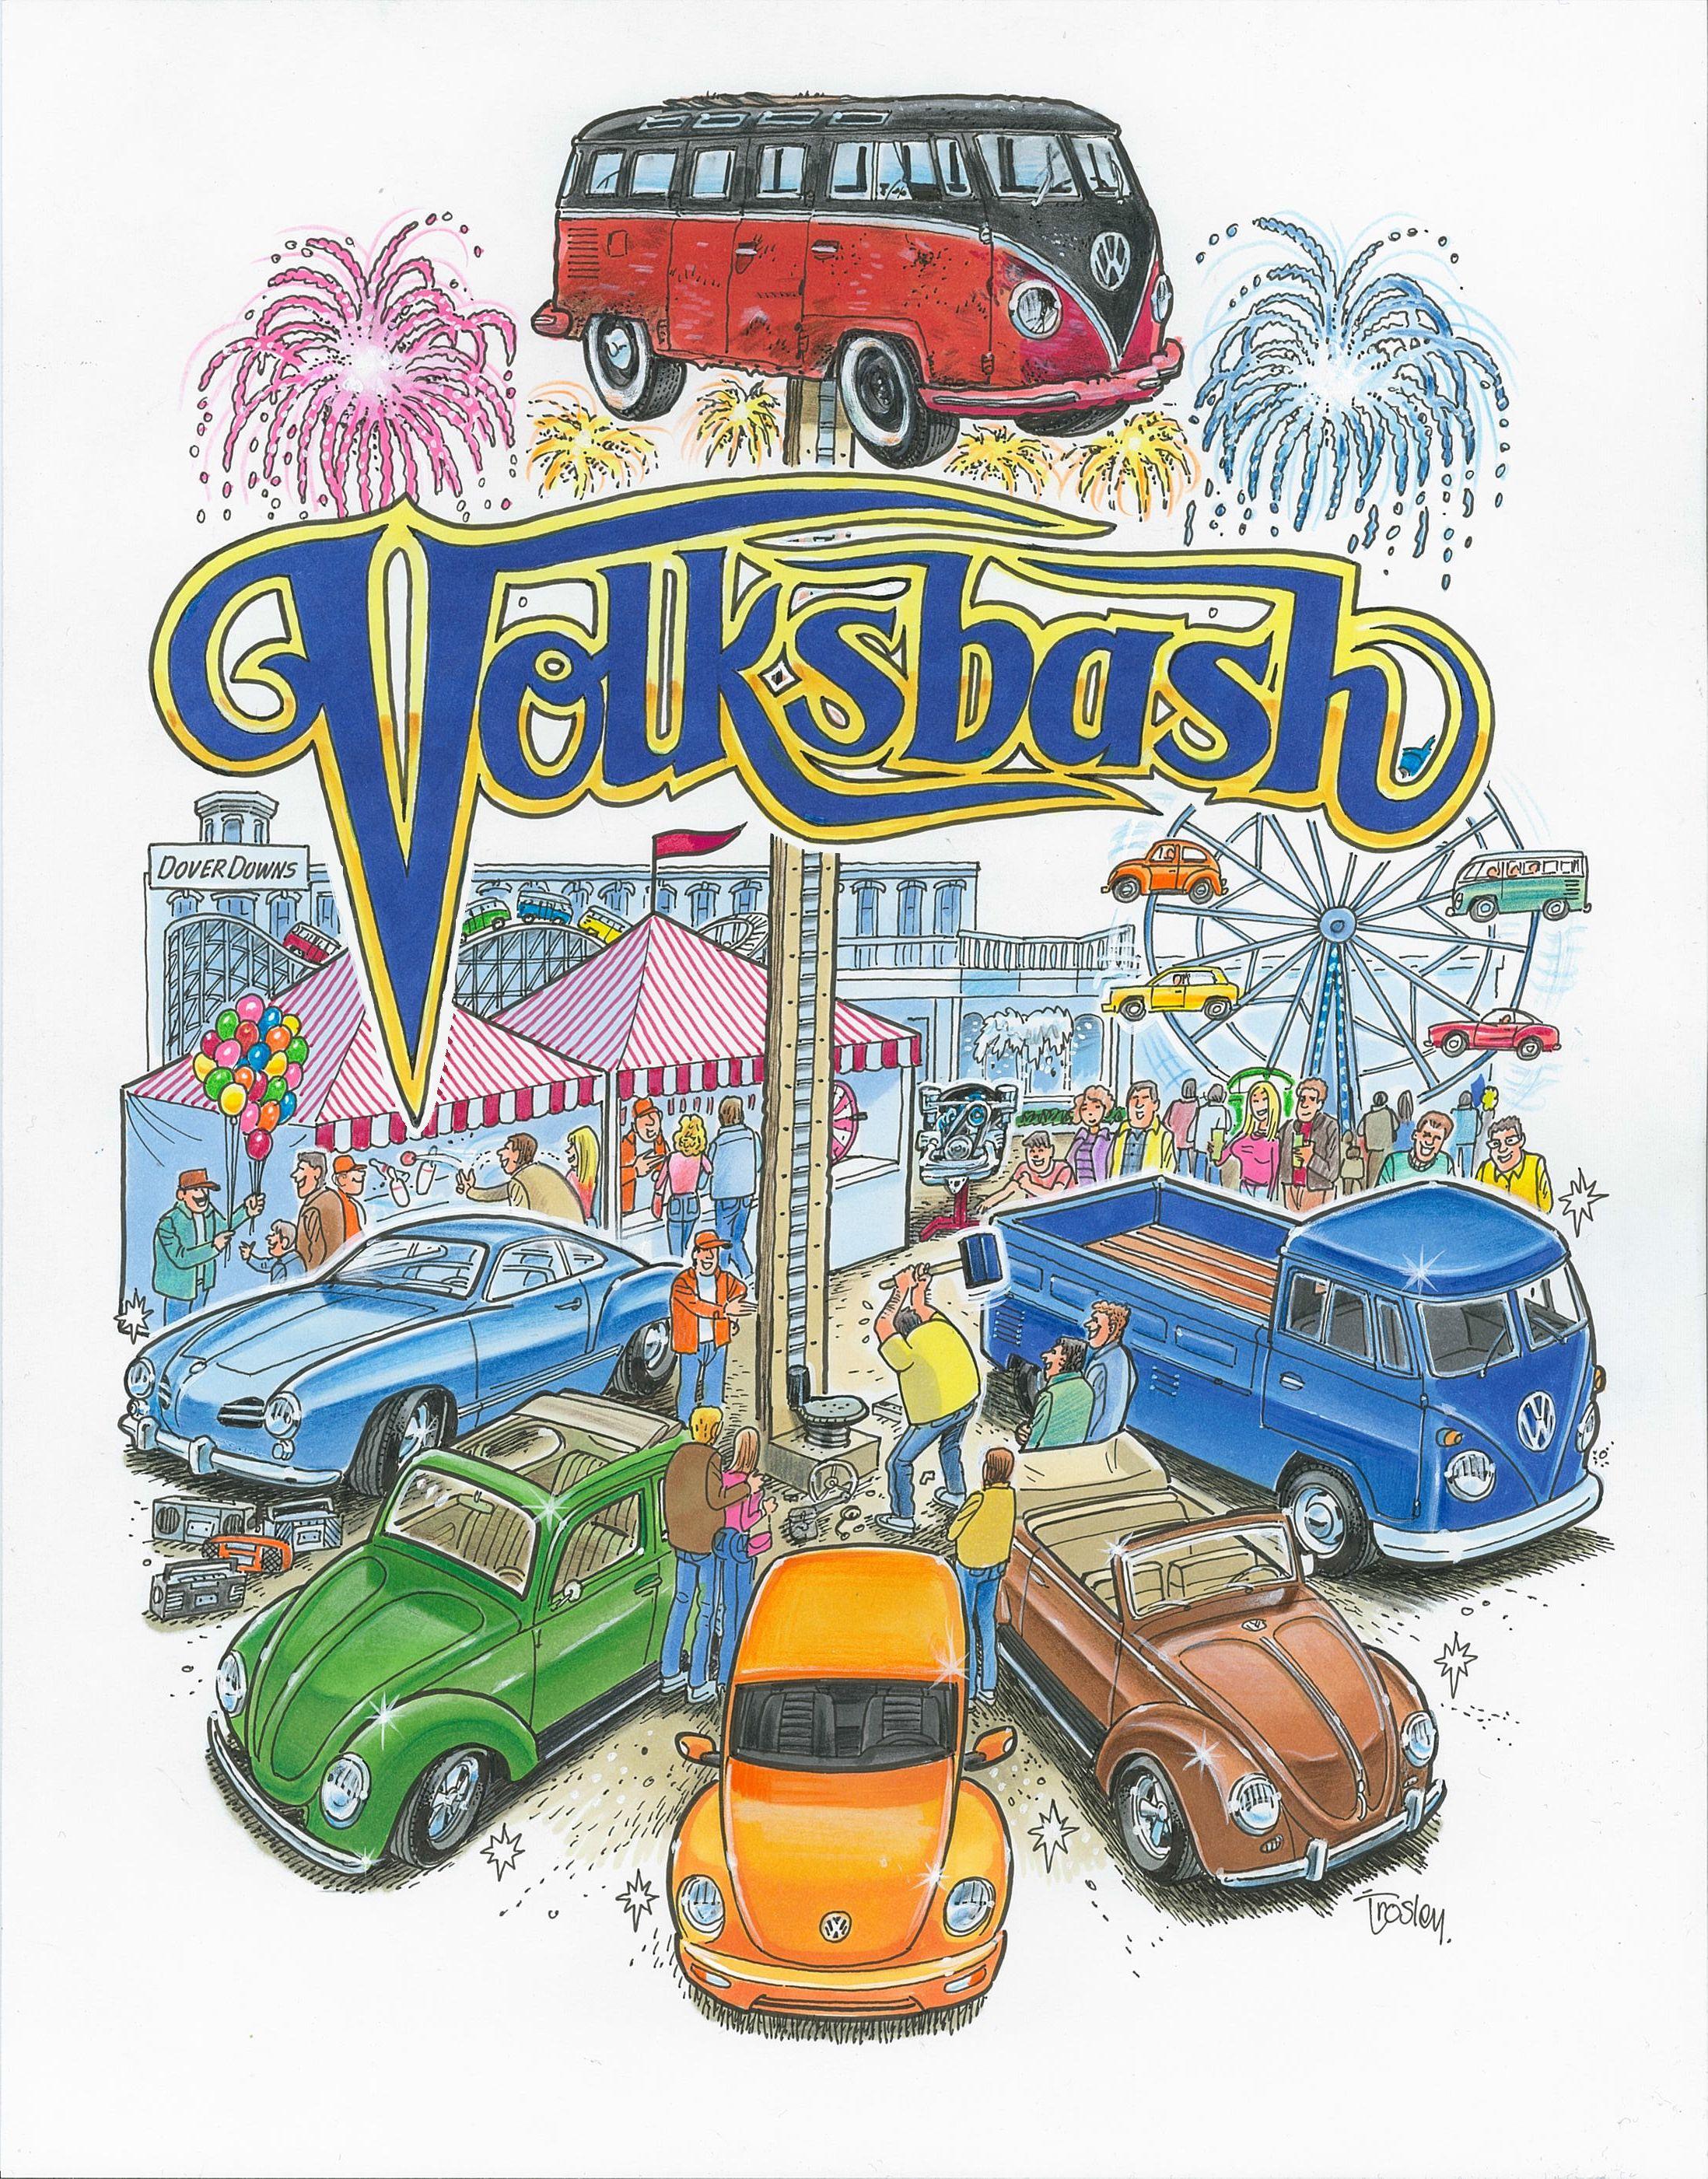 VOLKSBASH! September 7th, 2014 Vw aircooled, Vw art